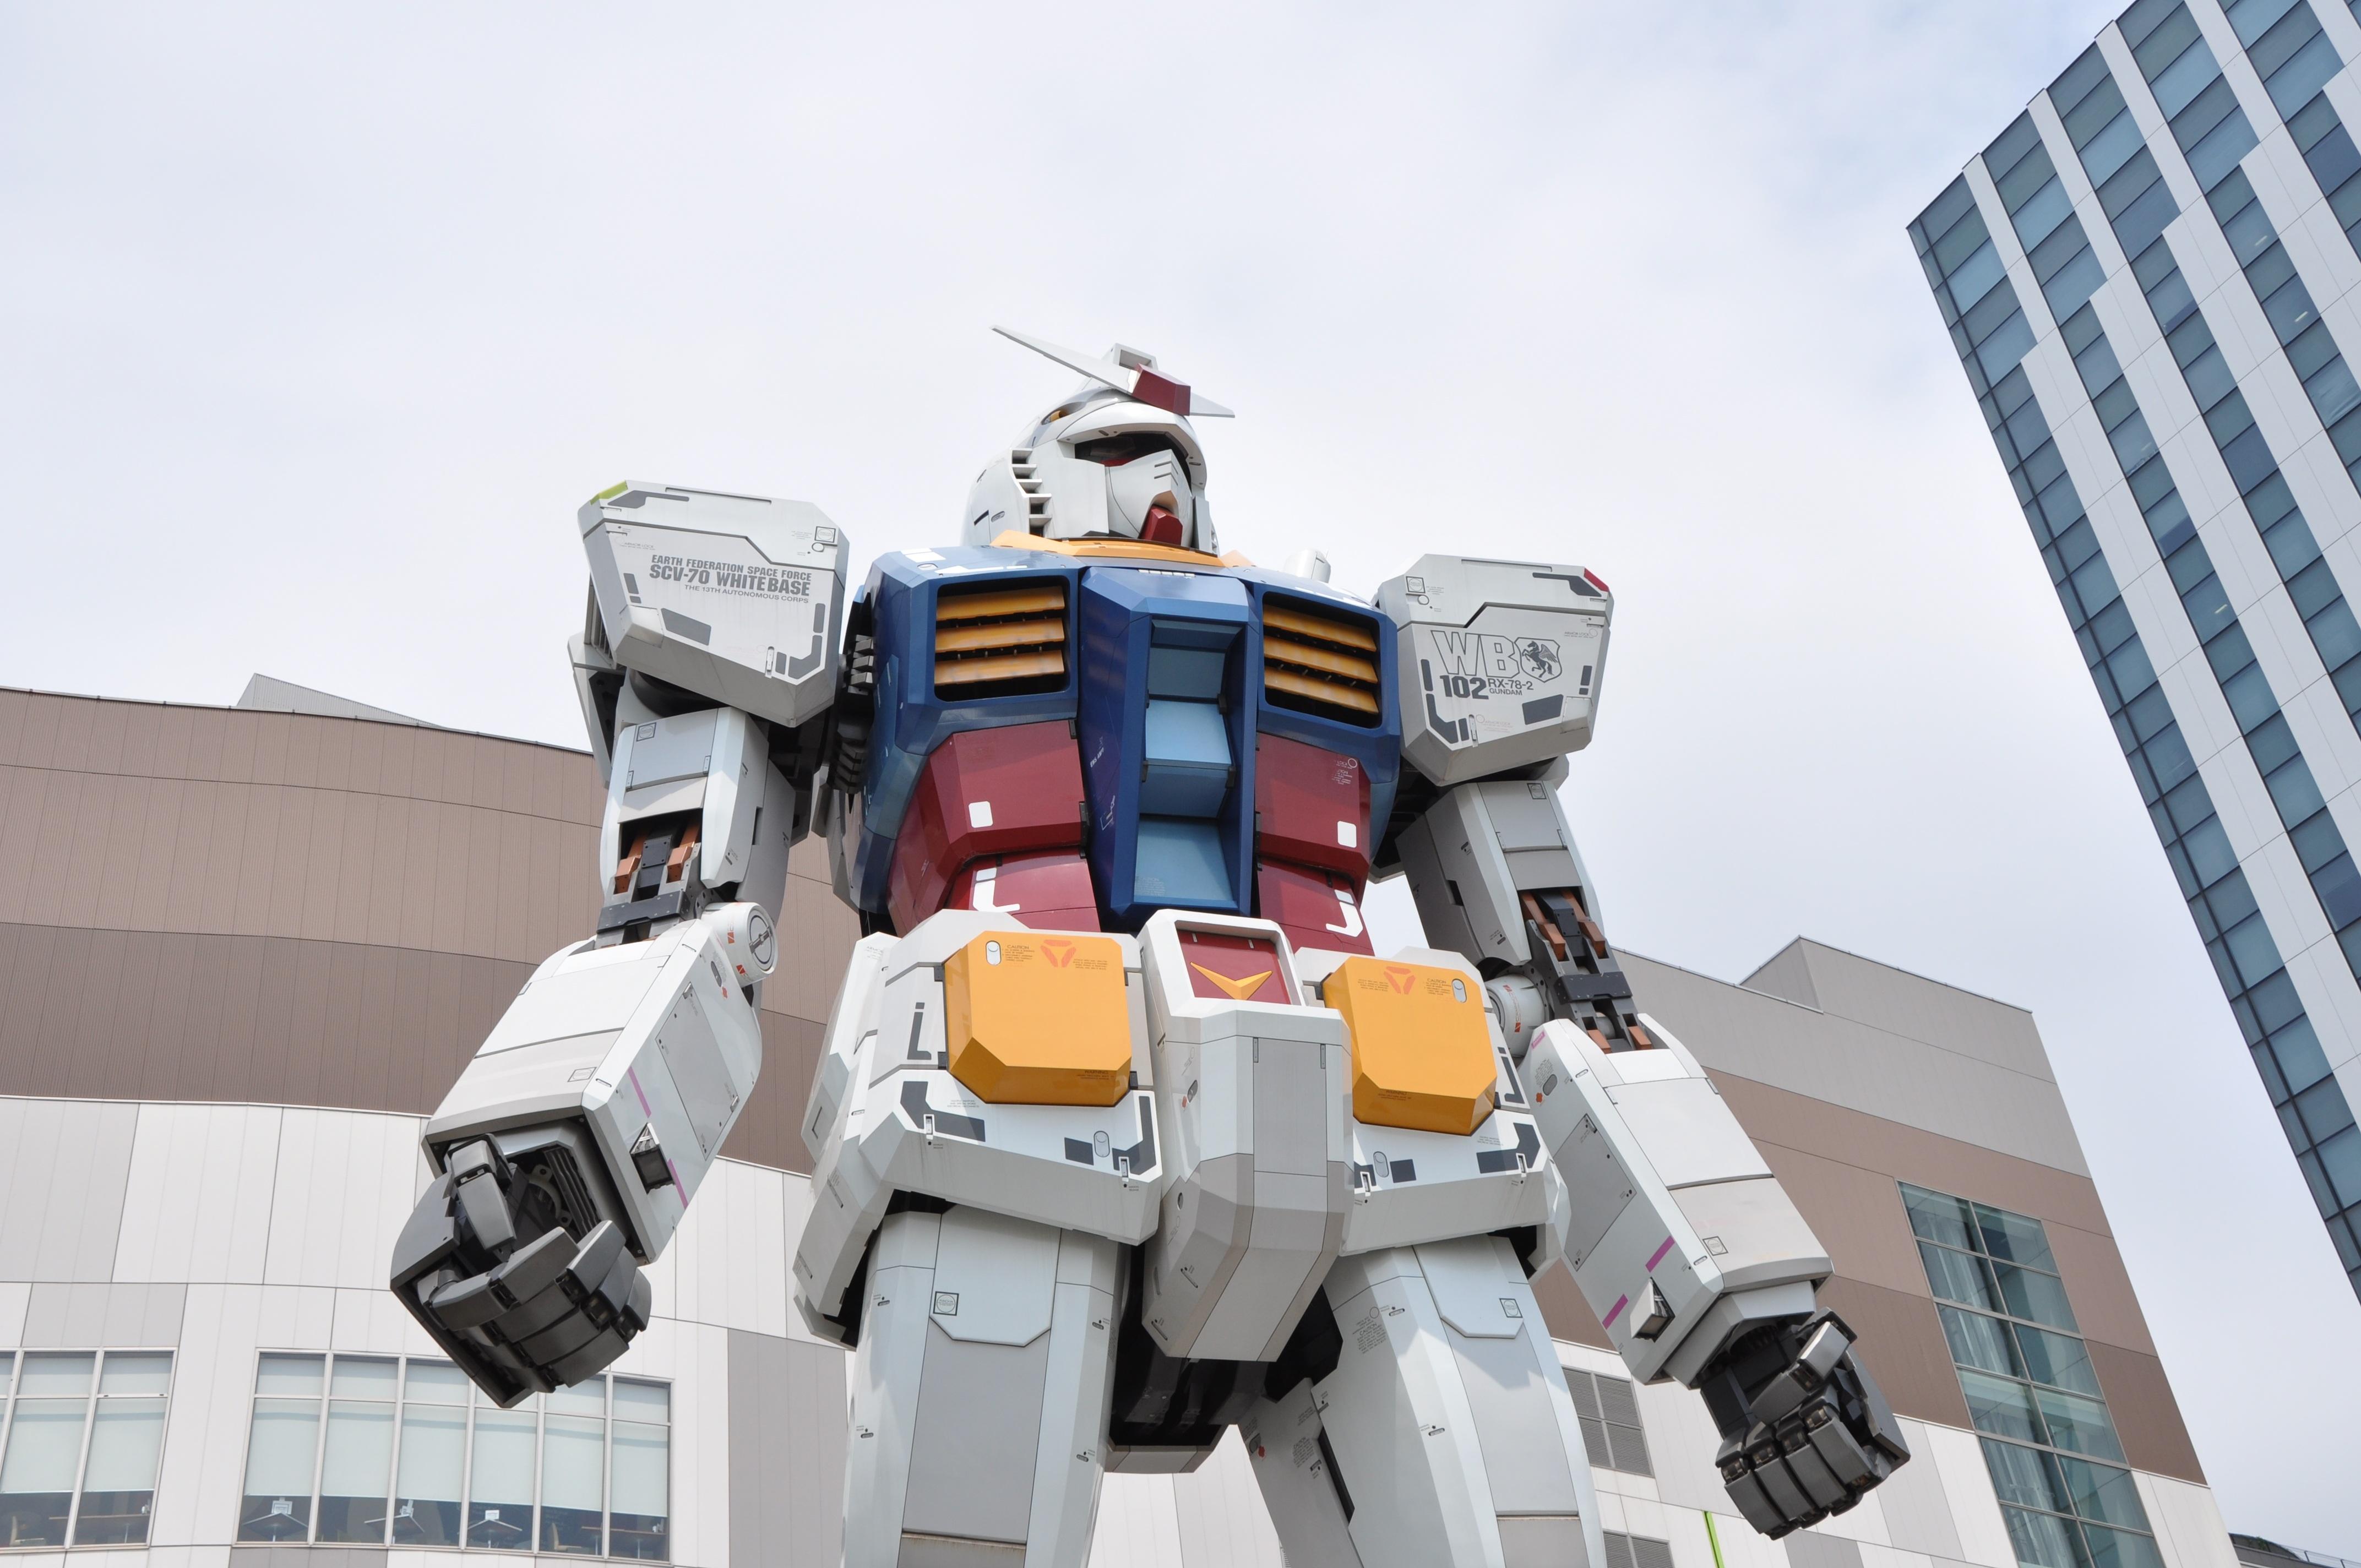 Free Images : statue, machine, toy, lego, robot, odaiba